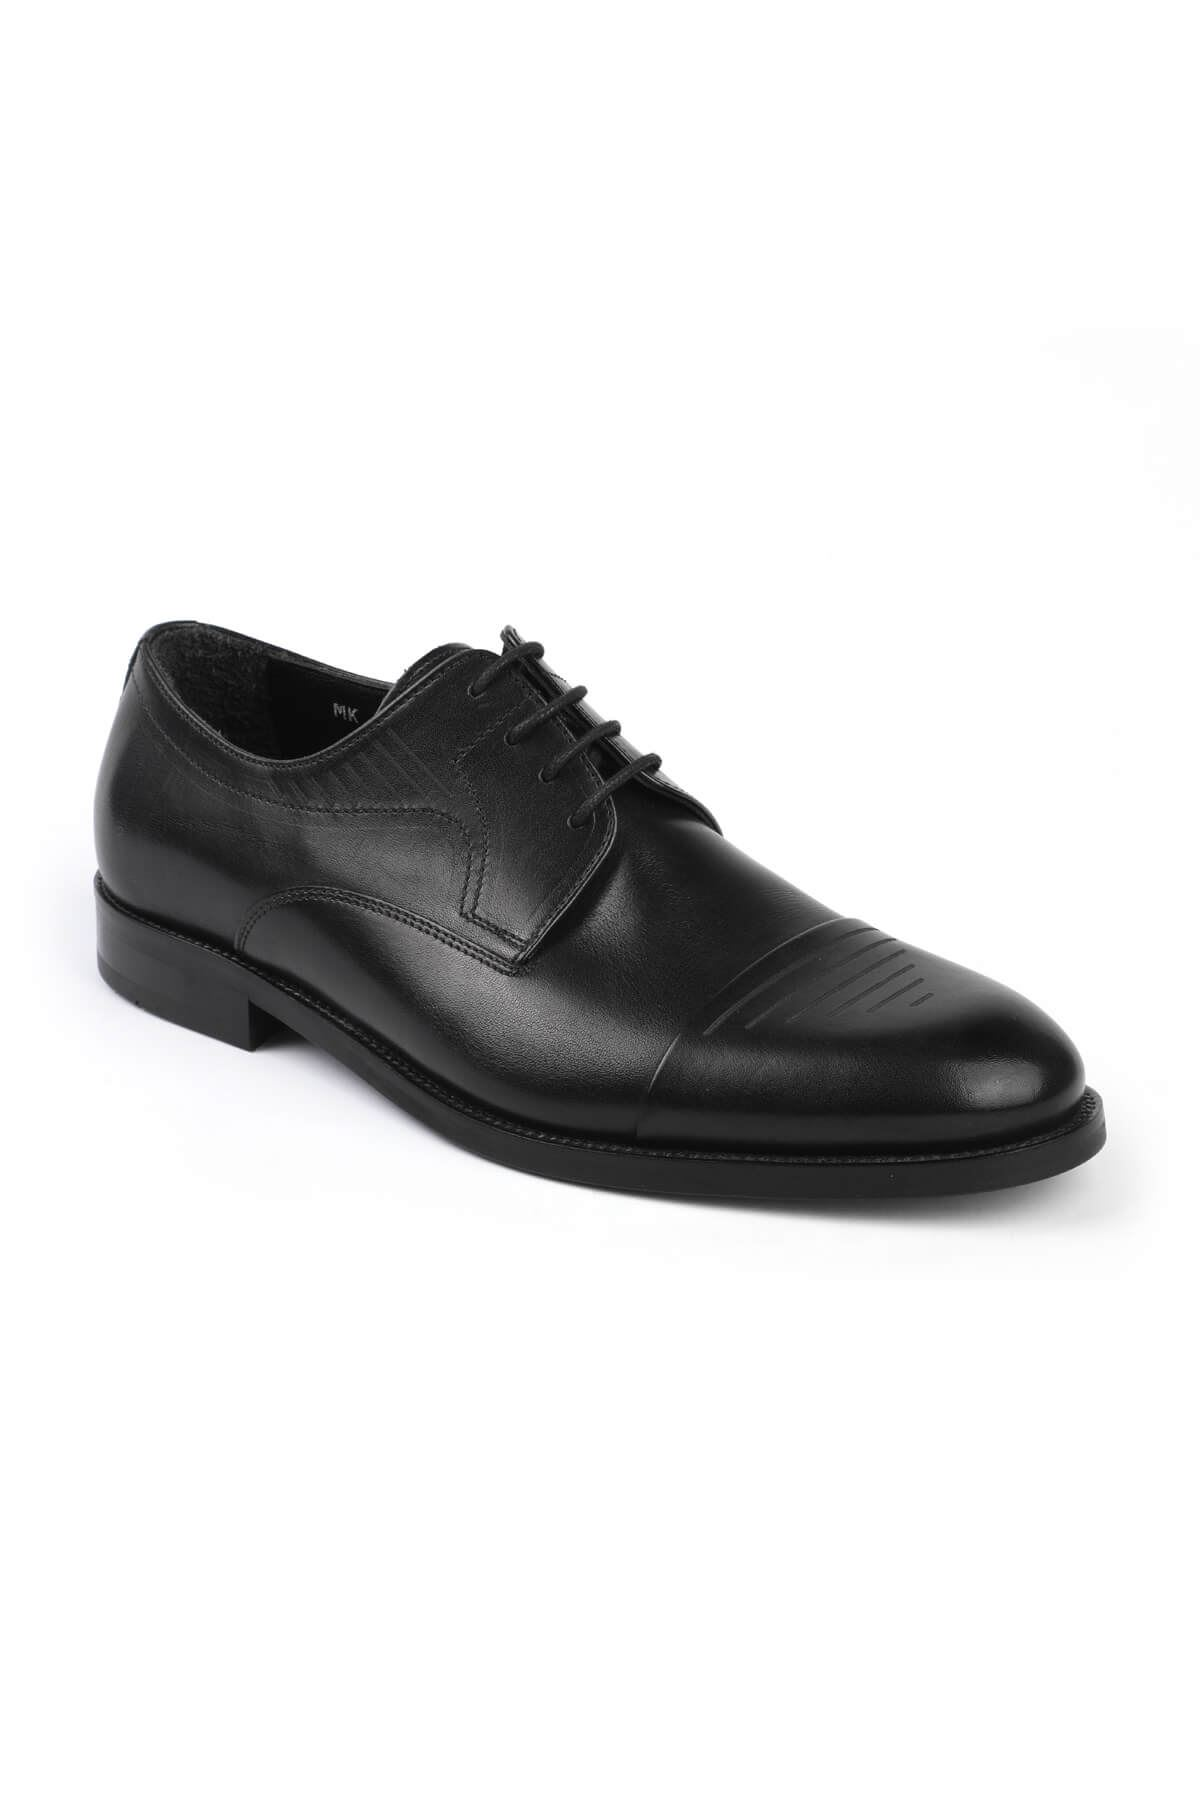 Libero 2776 Black Classic Shoes